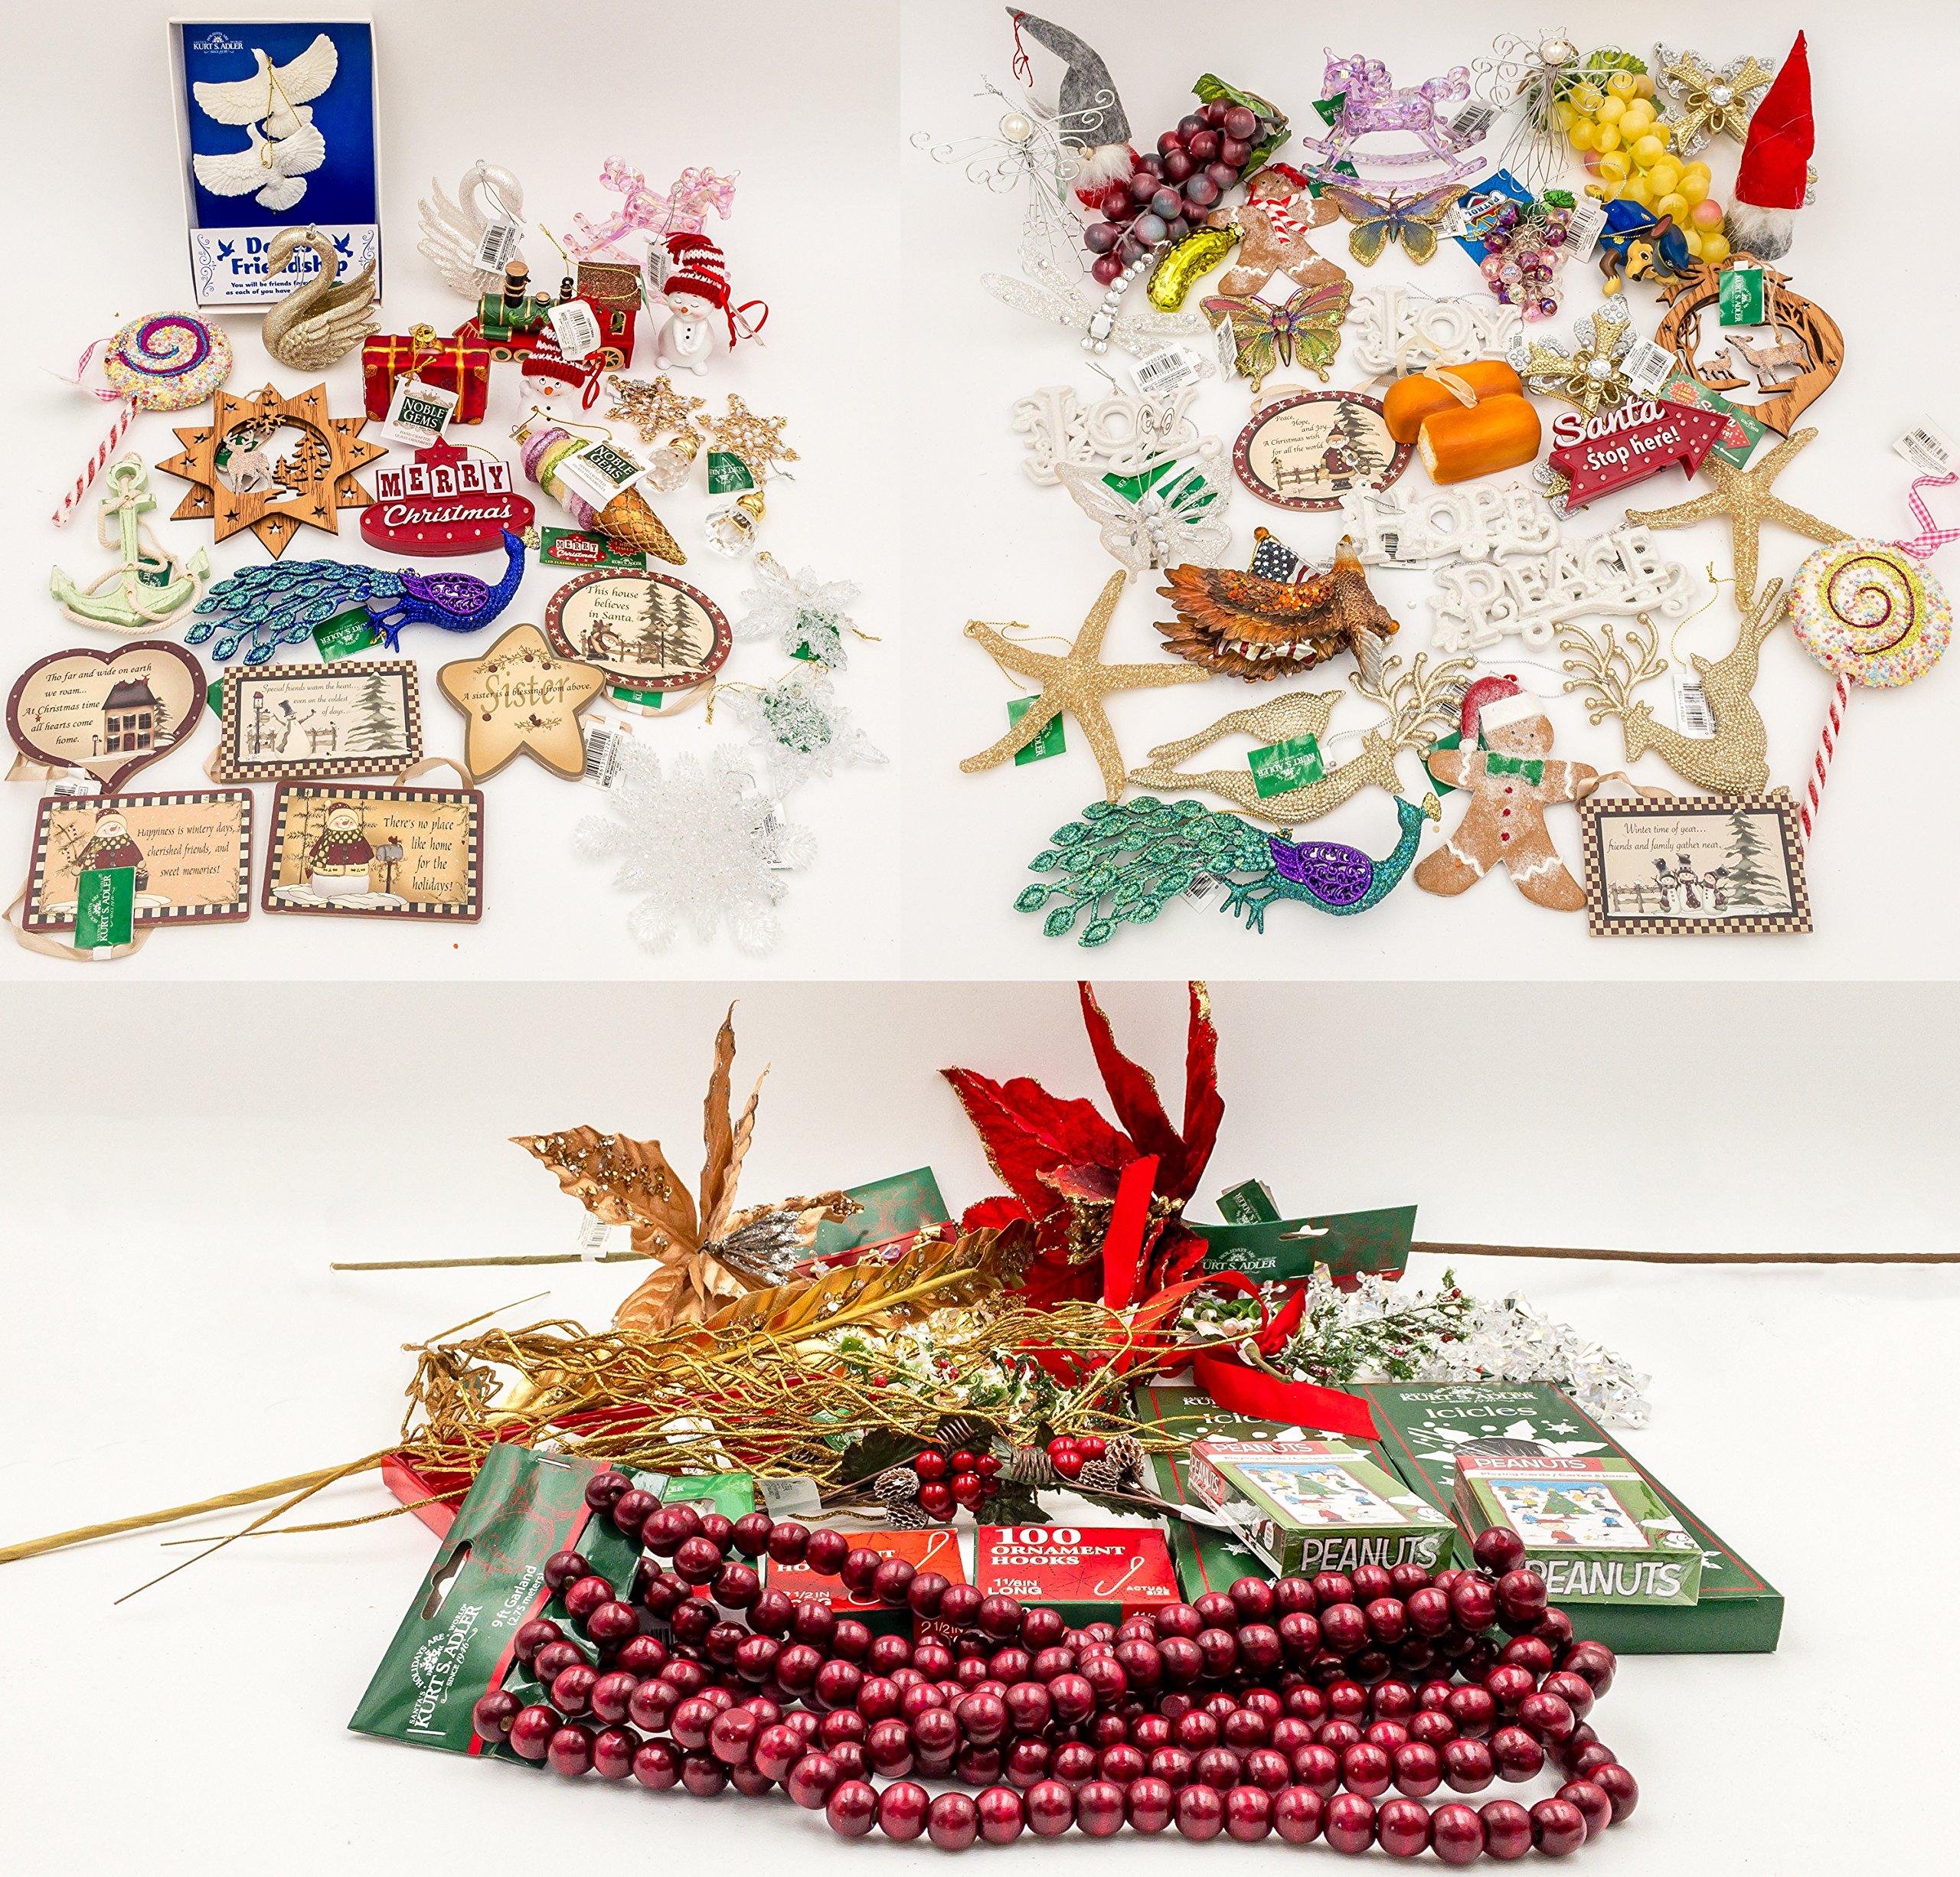 JZ Bundles Mega Set - Best of Christmas - Kurt Adler - 86-Piece Bundle - A Bundle of Christmas Ornaments Great Gift